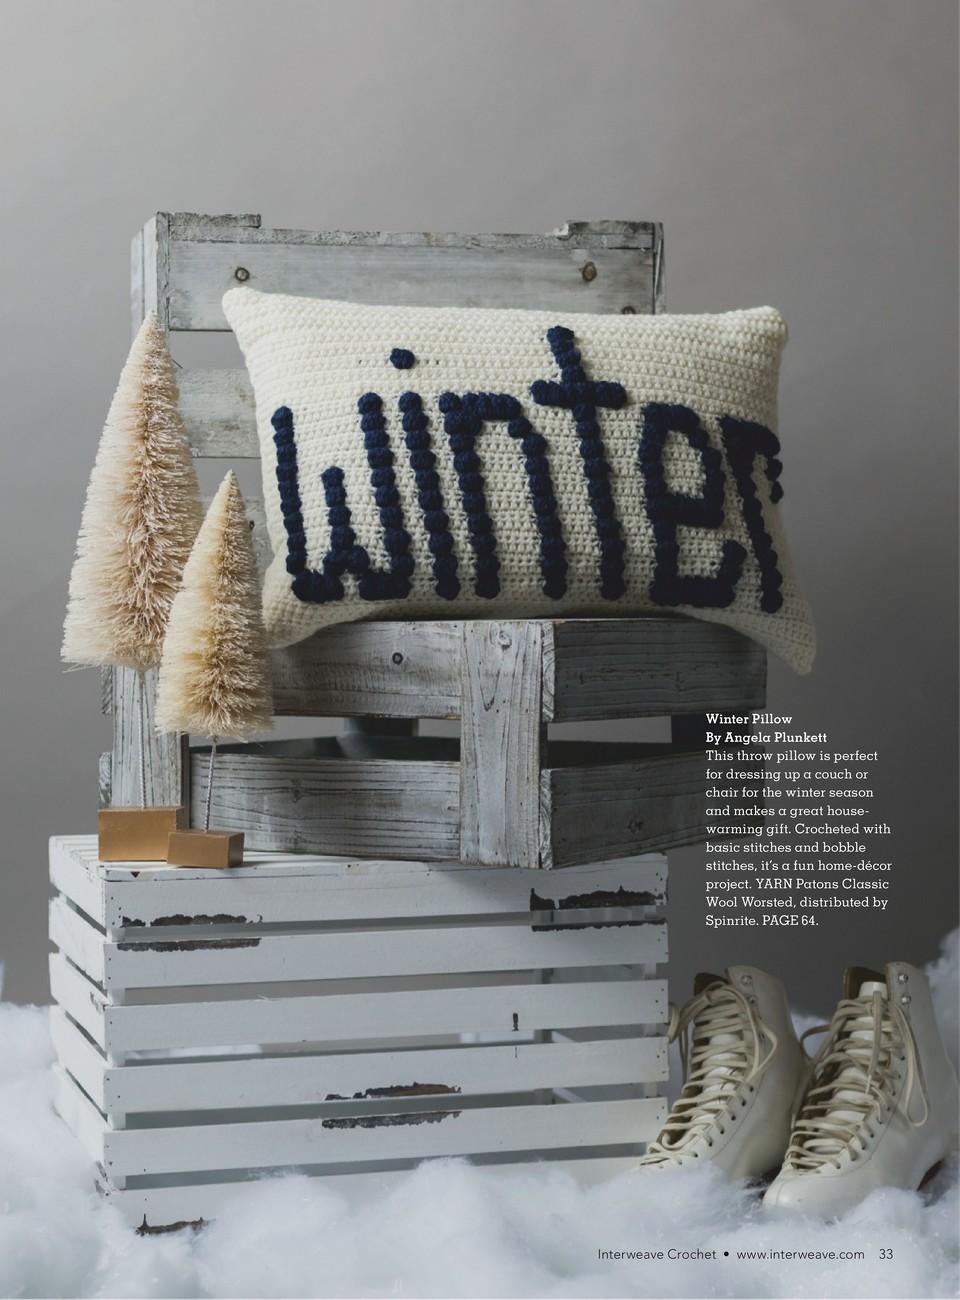 Interweave Crochet Winter 2019-34